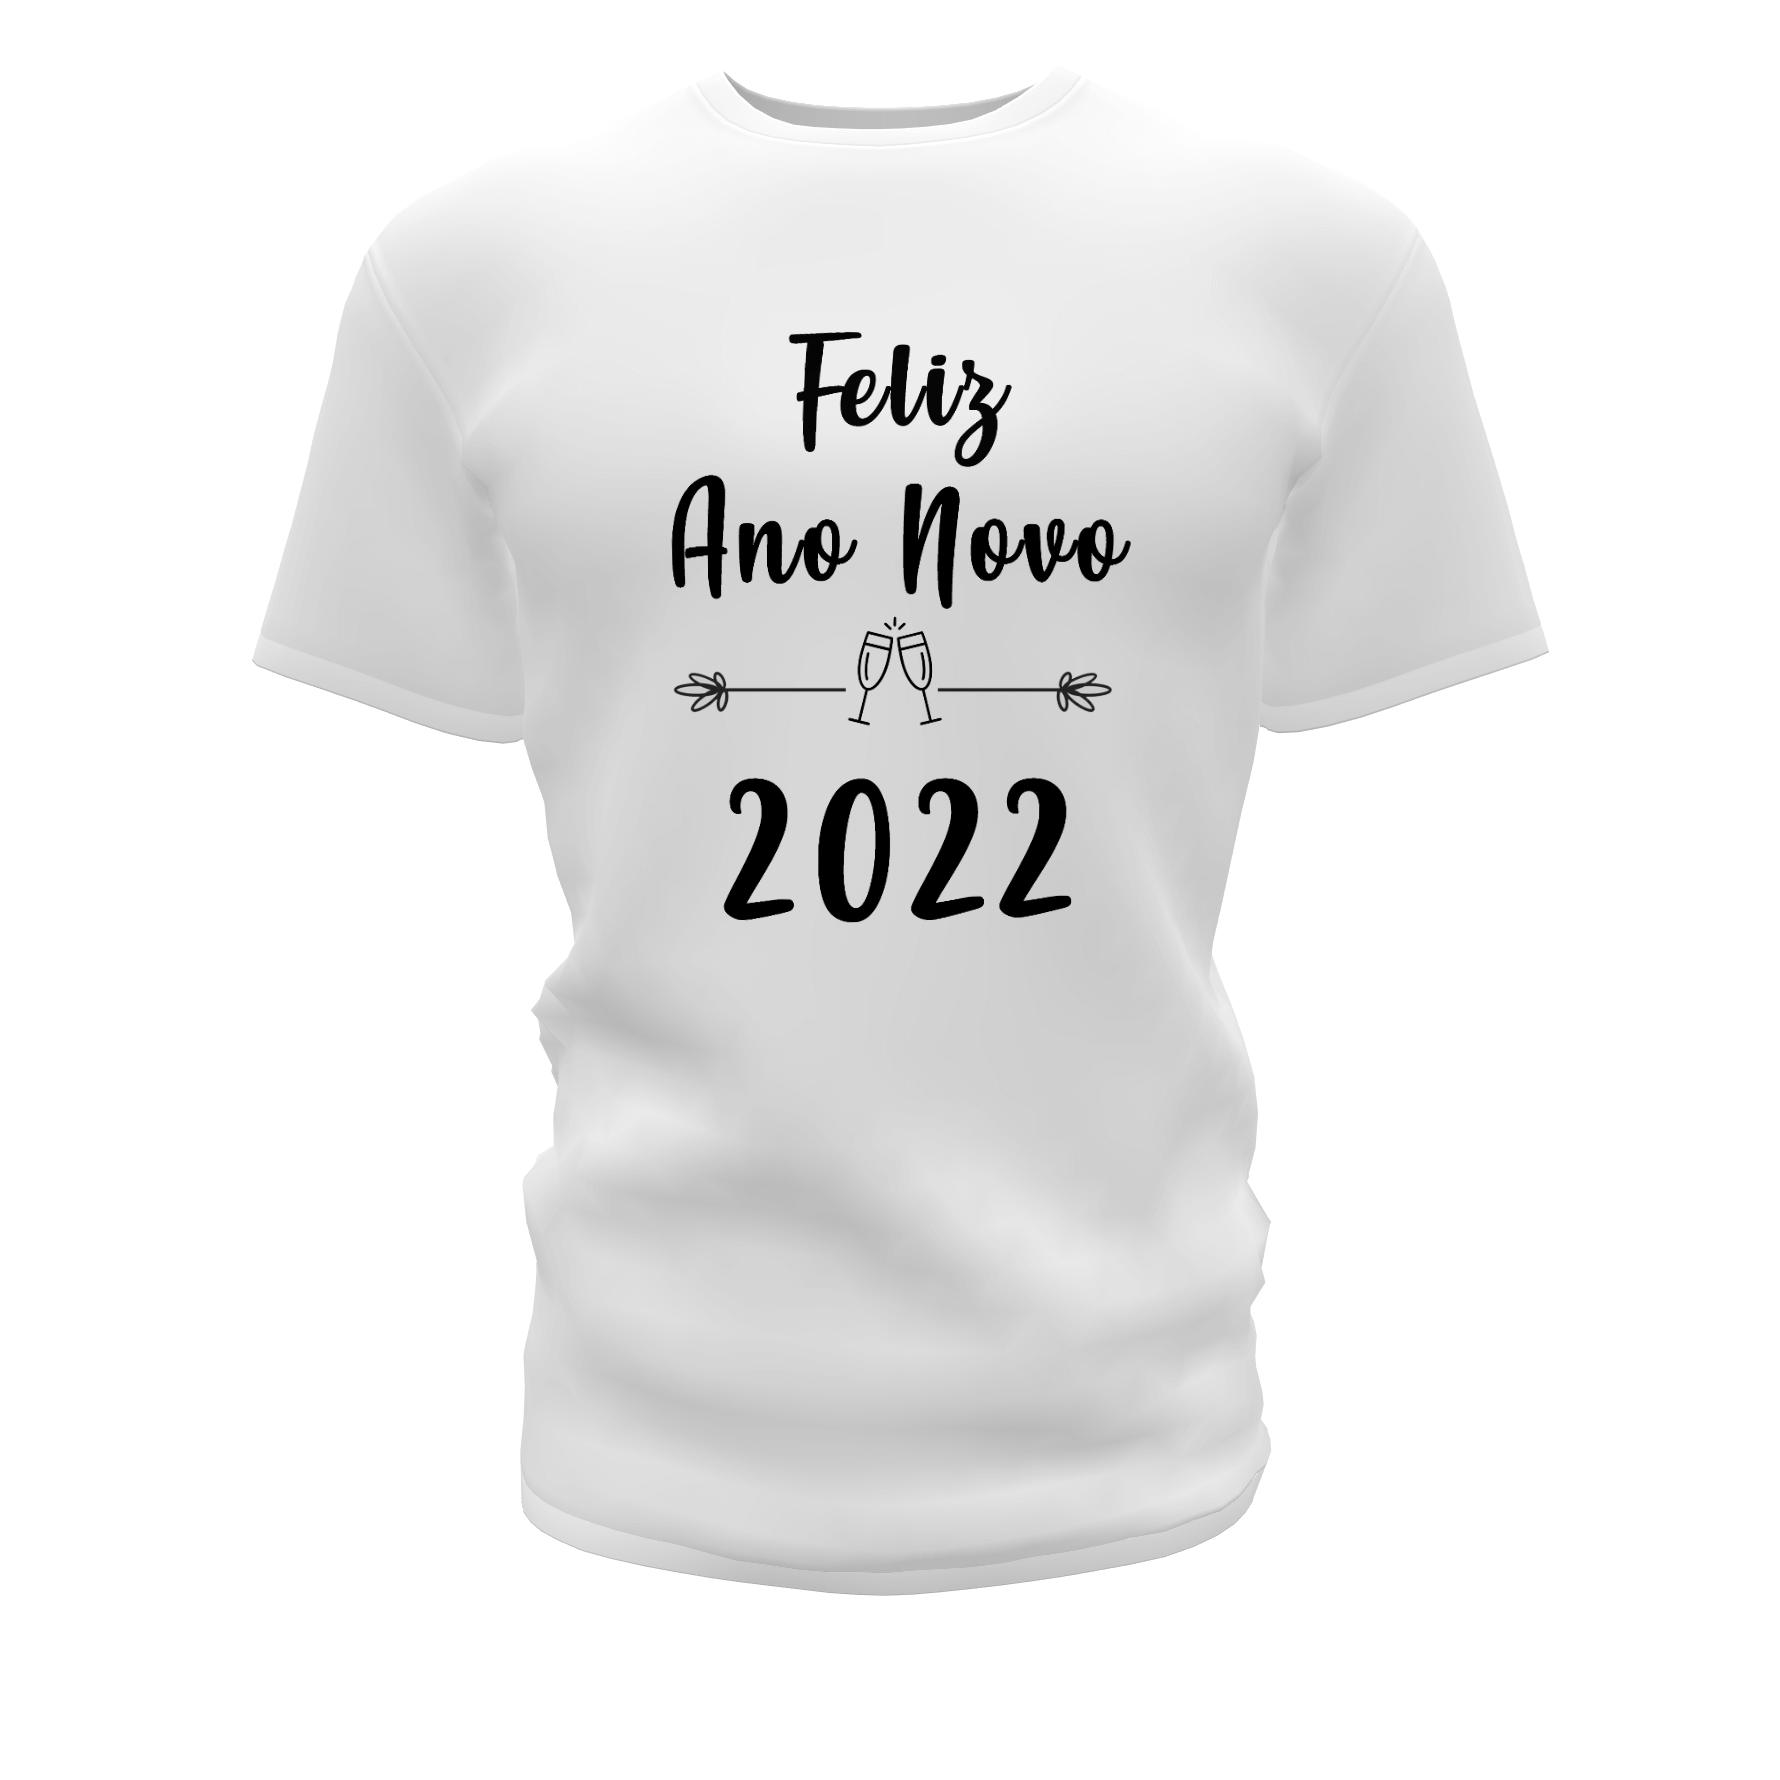 Camisetas Personalizadas para Réveillon